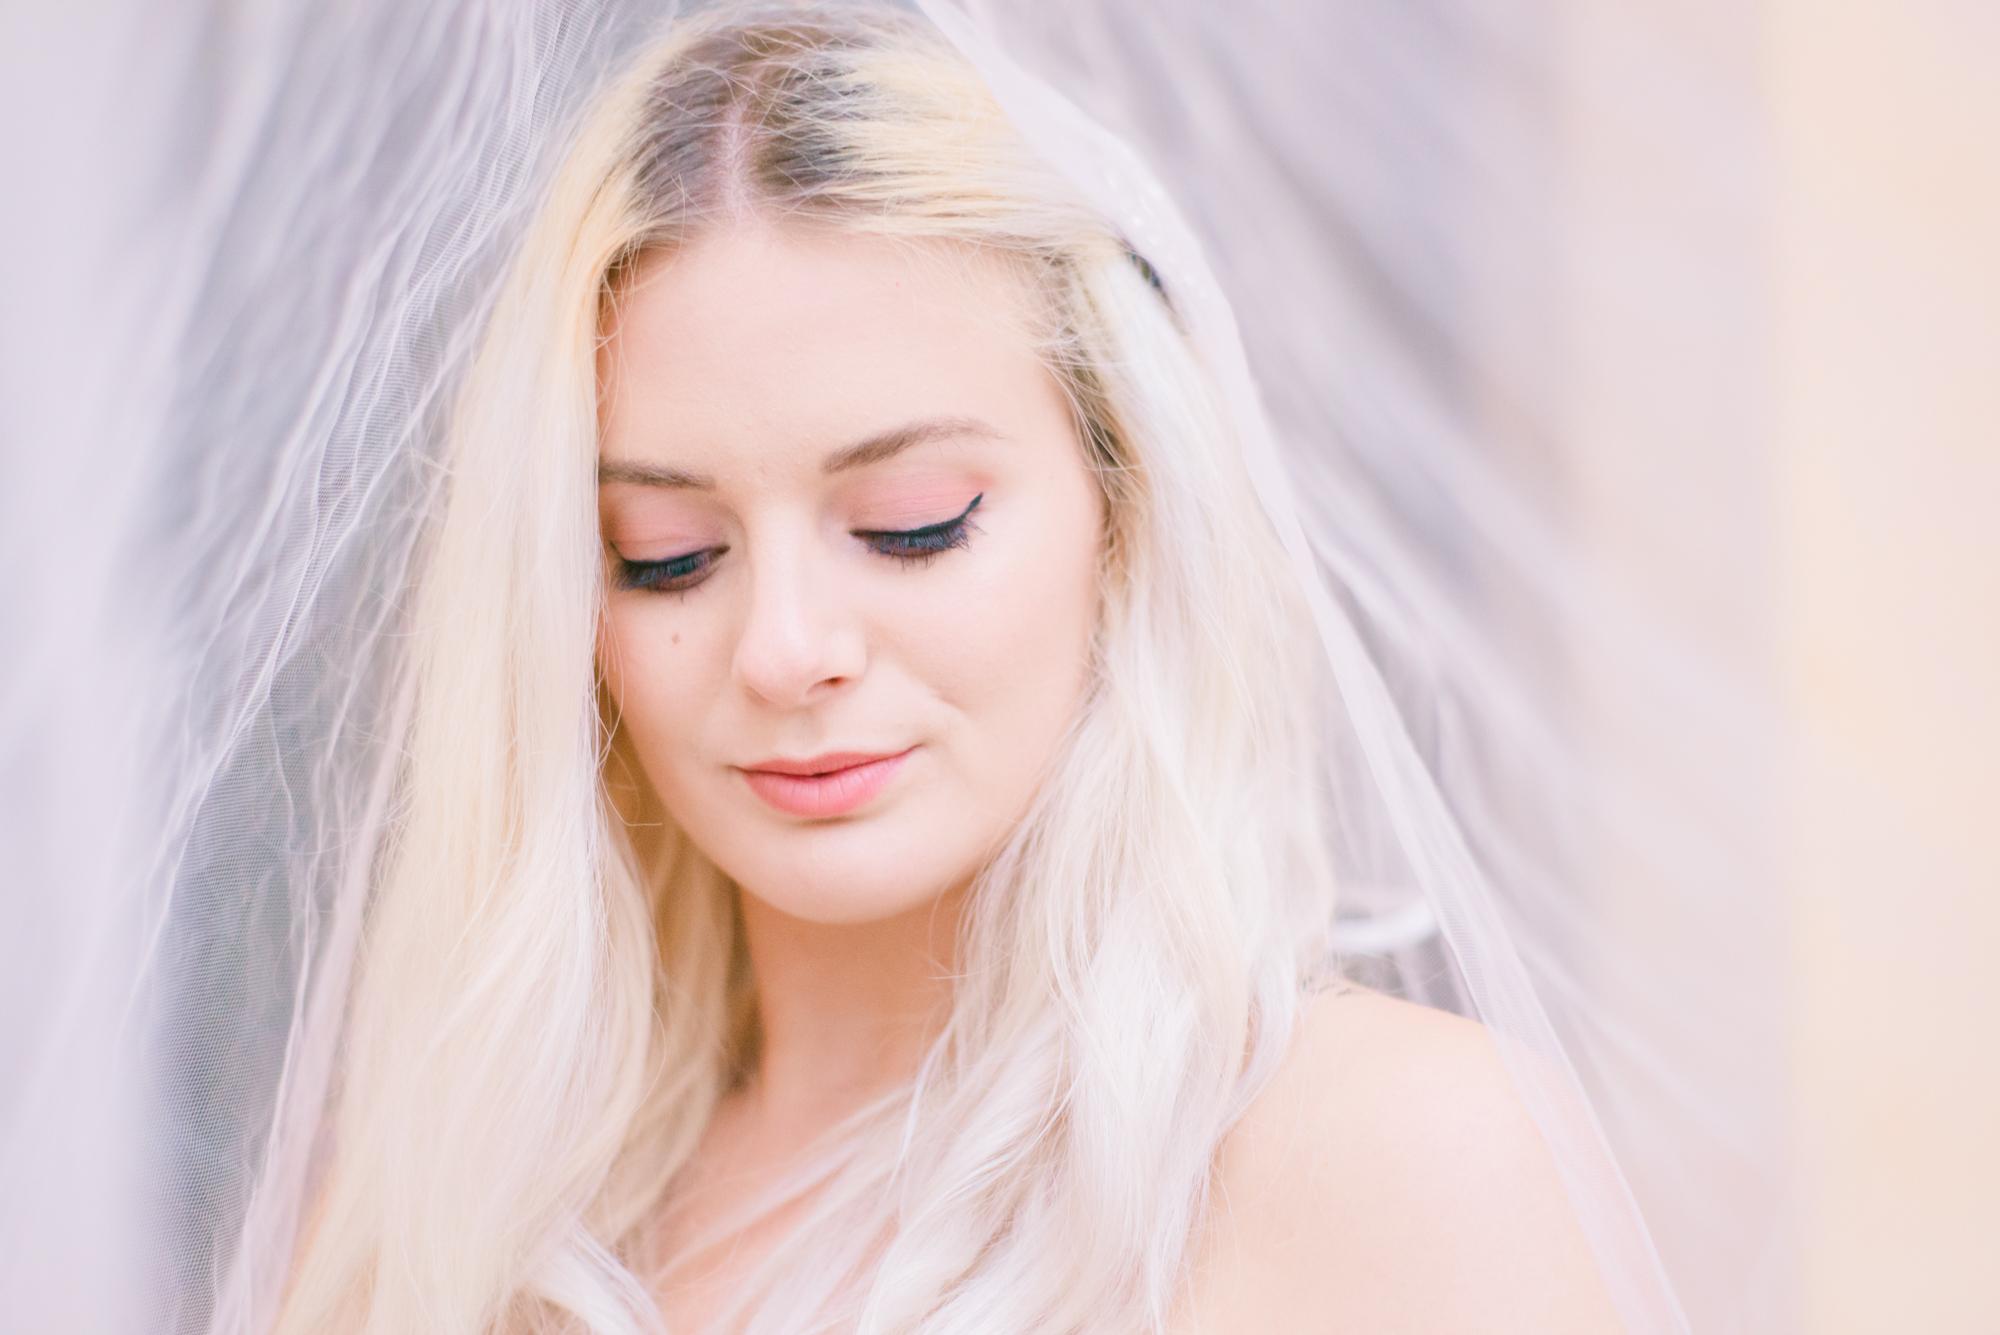 Elegant Organic Fall Swedish Bridal Wedding Styled Shoot - Erika Alvarenga Photography-72.jpg